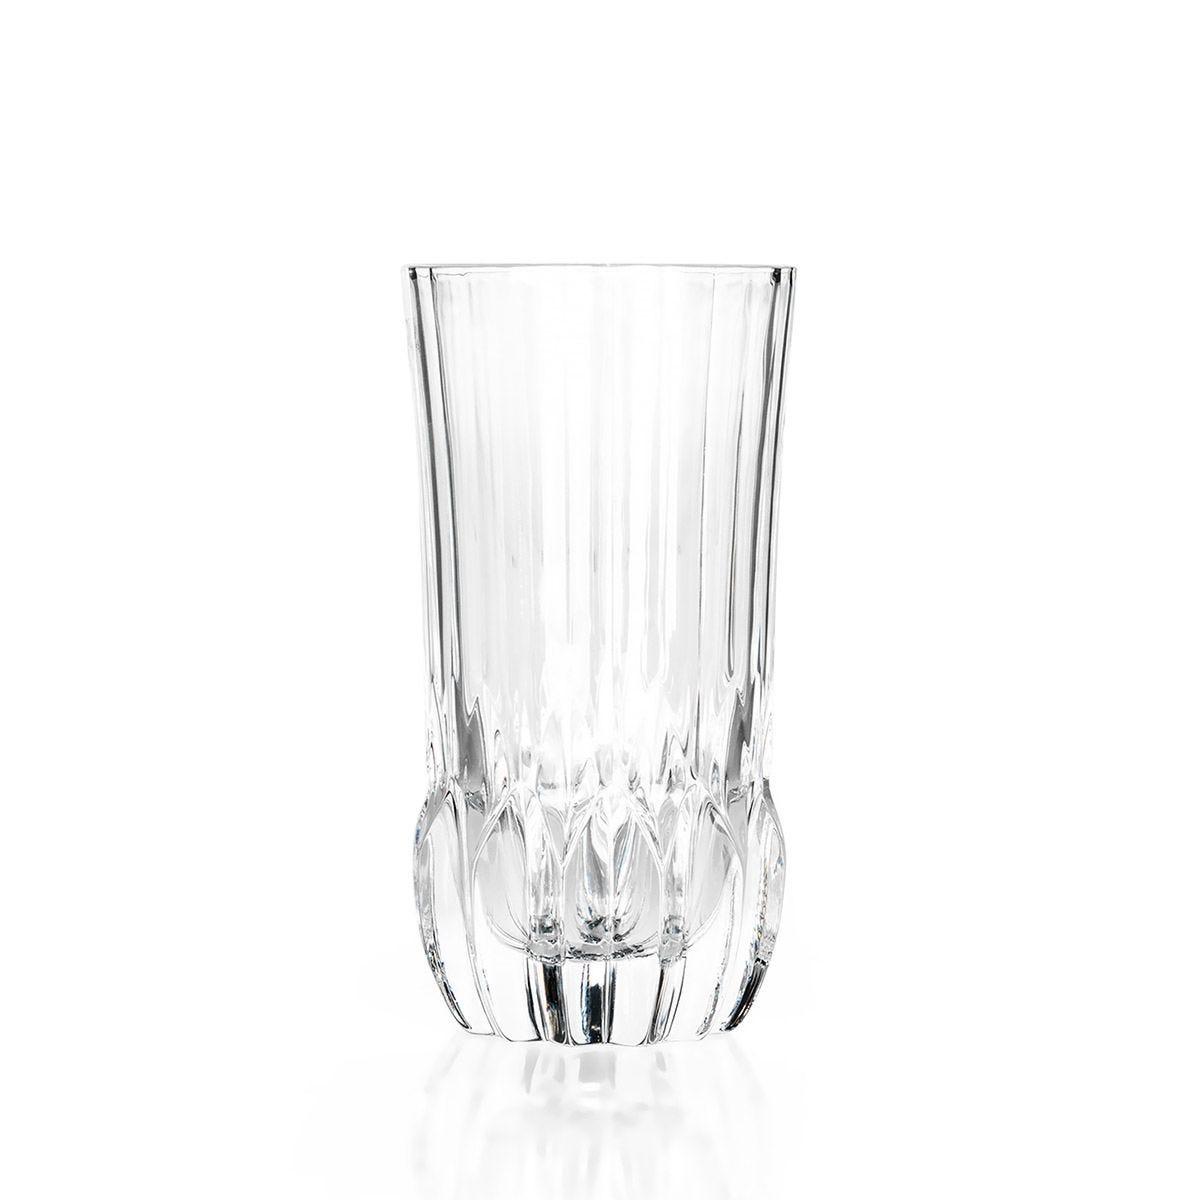 RCR Adagio Crystal Hi-Ball Tumblers Glasses Set of 6